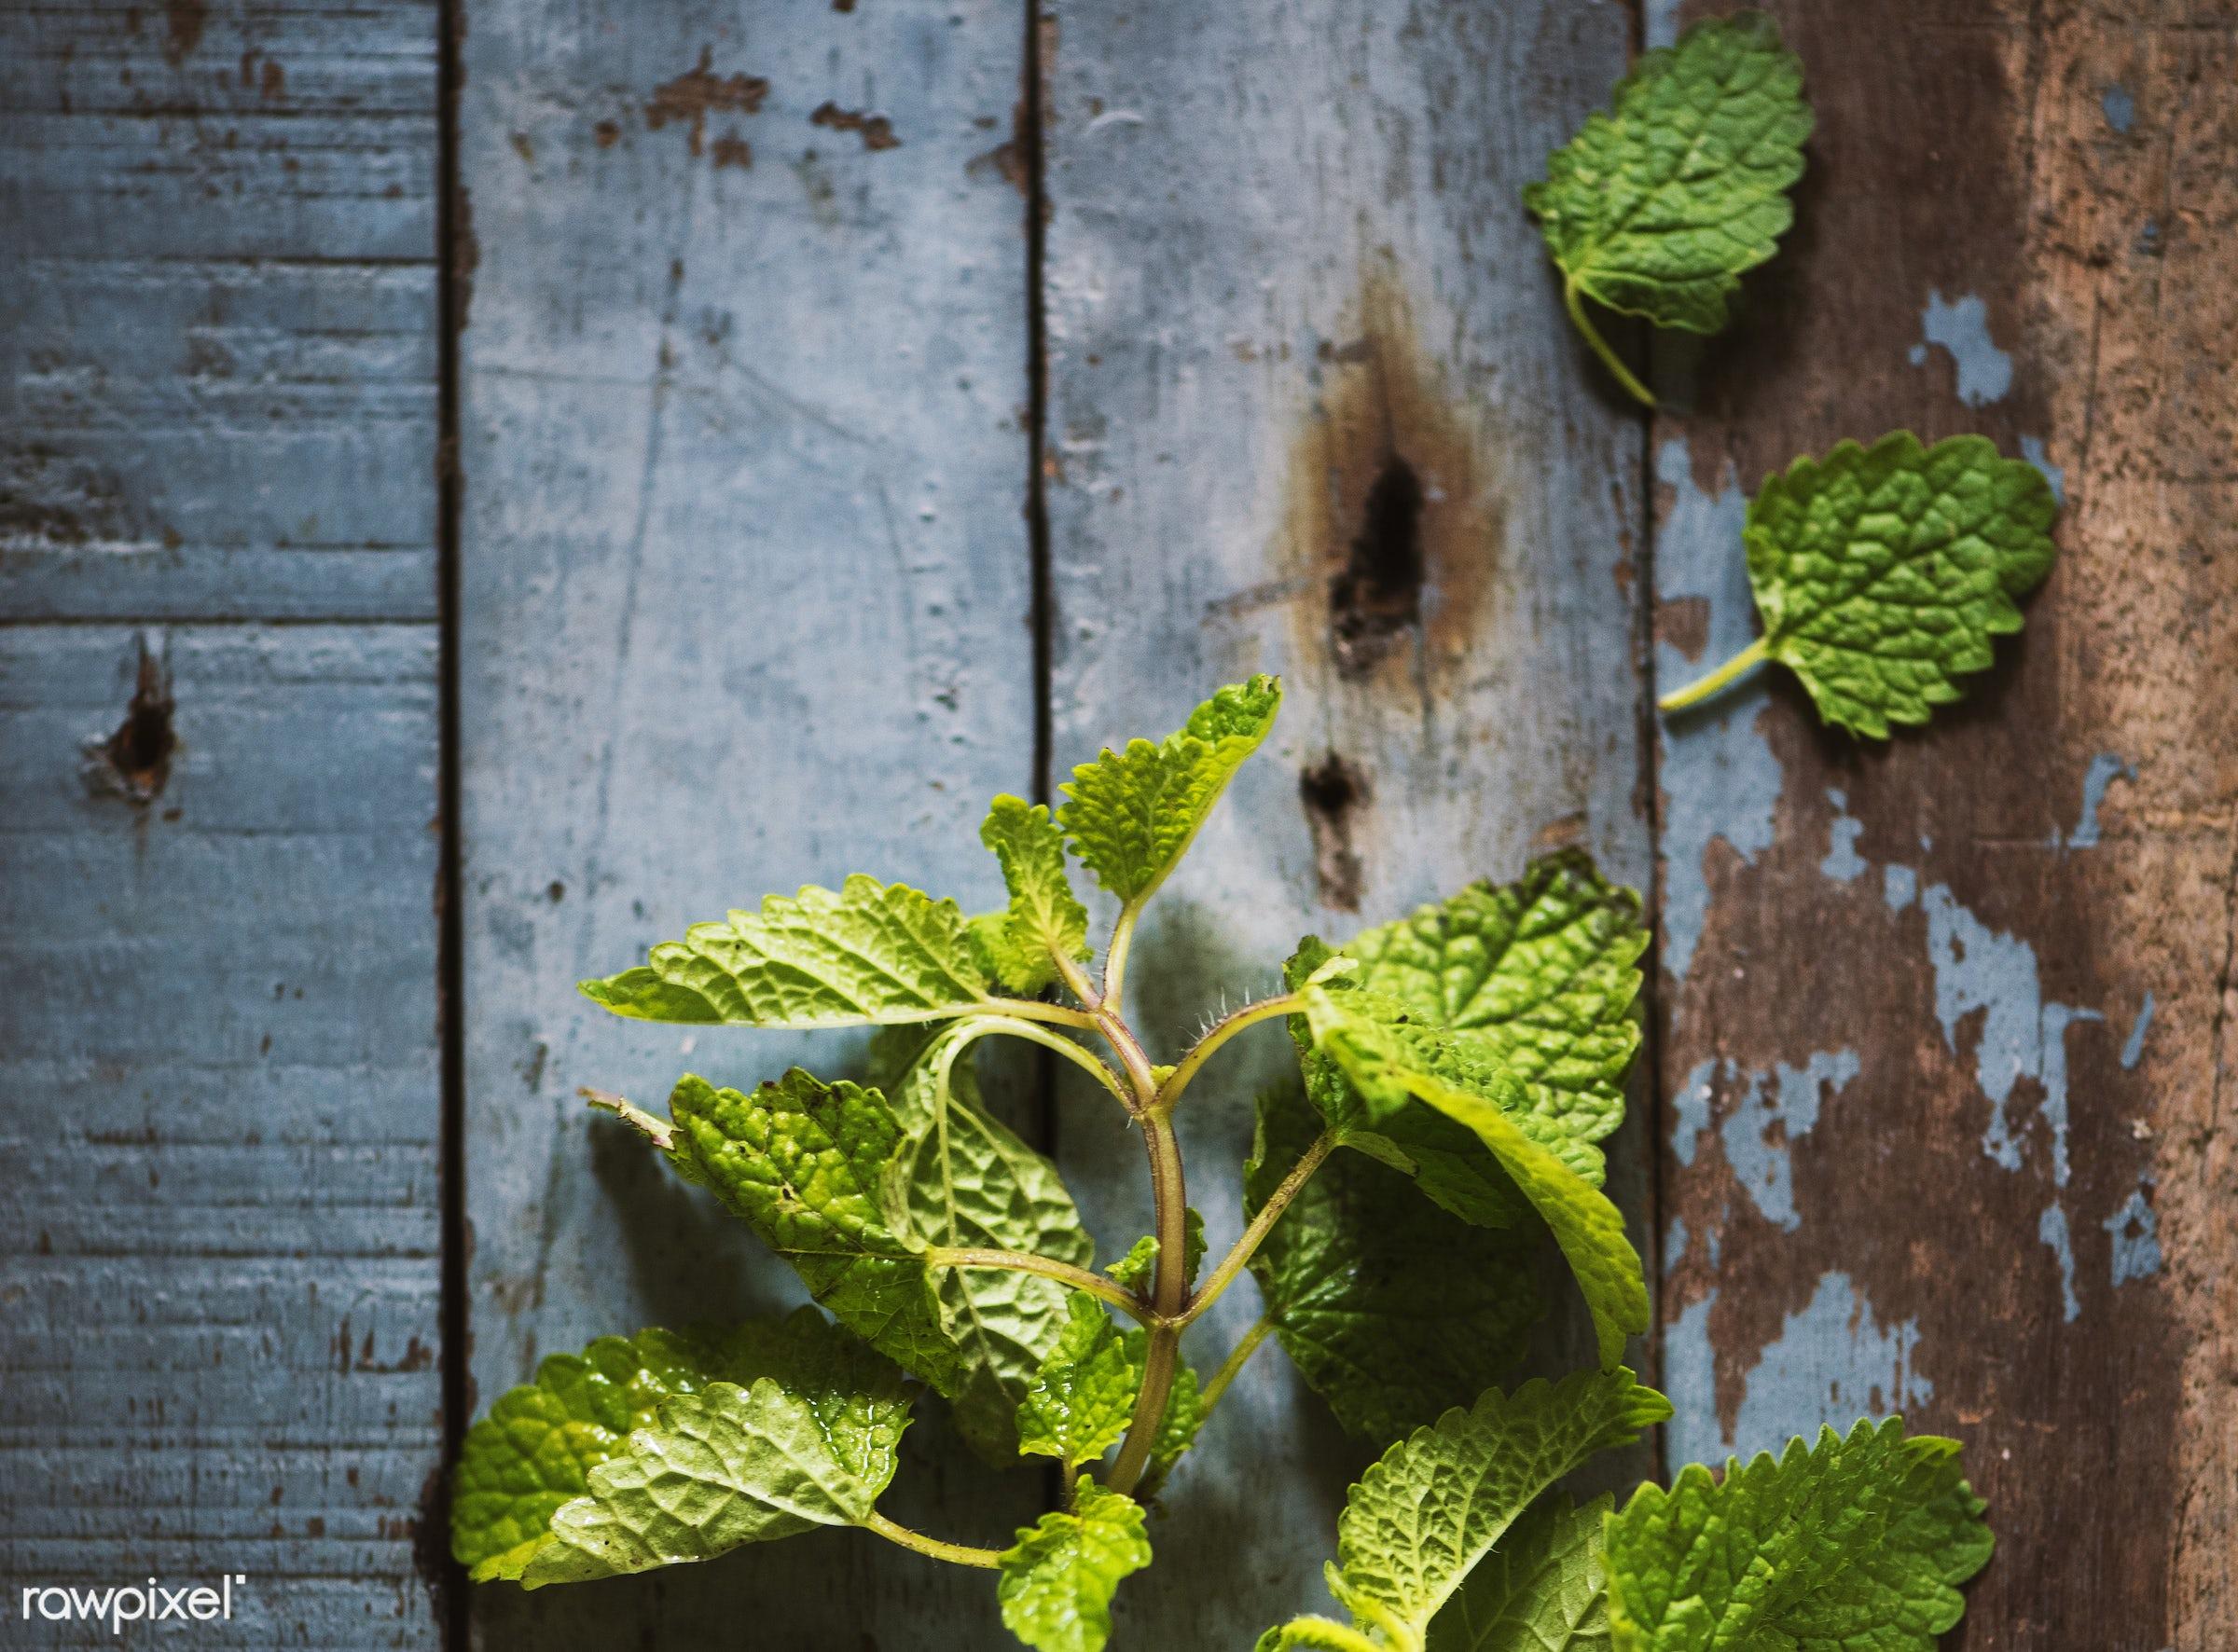 raw, herbs, fiber, fresh, ingredient, green, mint, culinary, veggies, edible, nutrition, organic, wooden, food, healthy,...